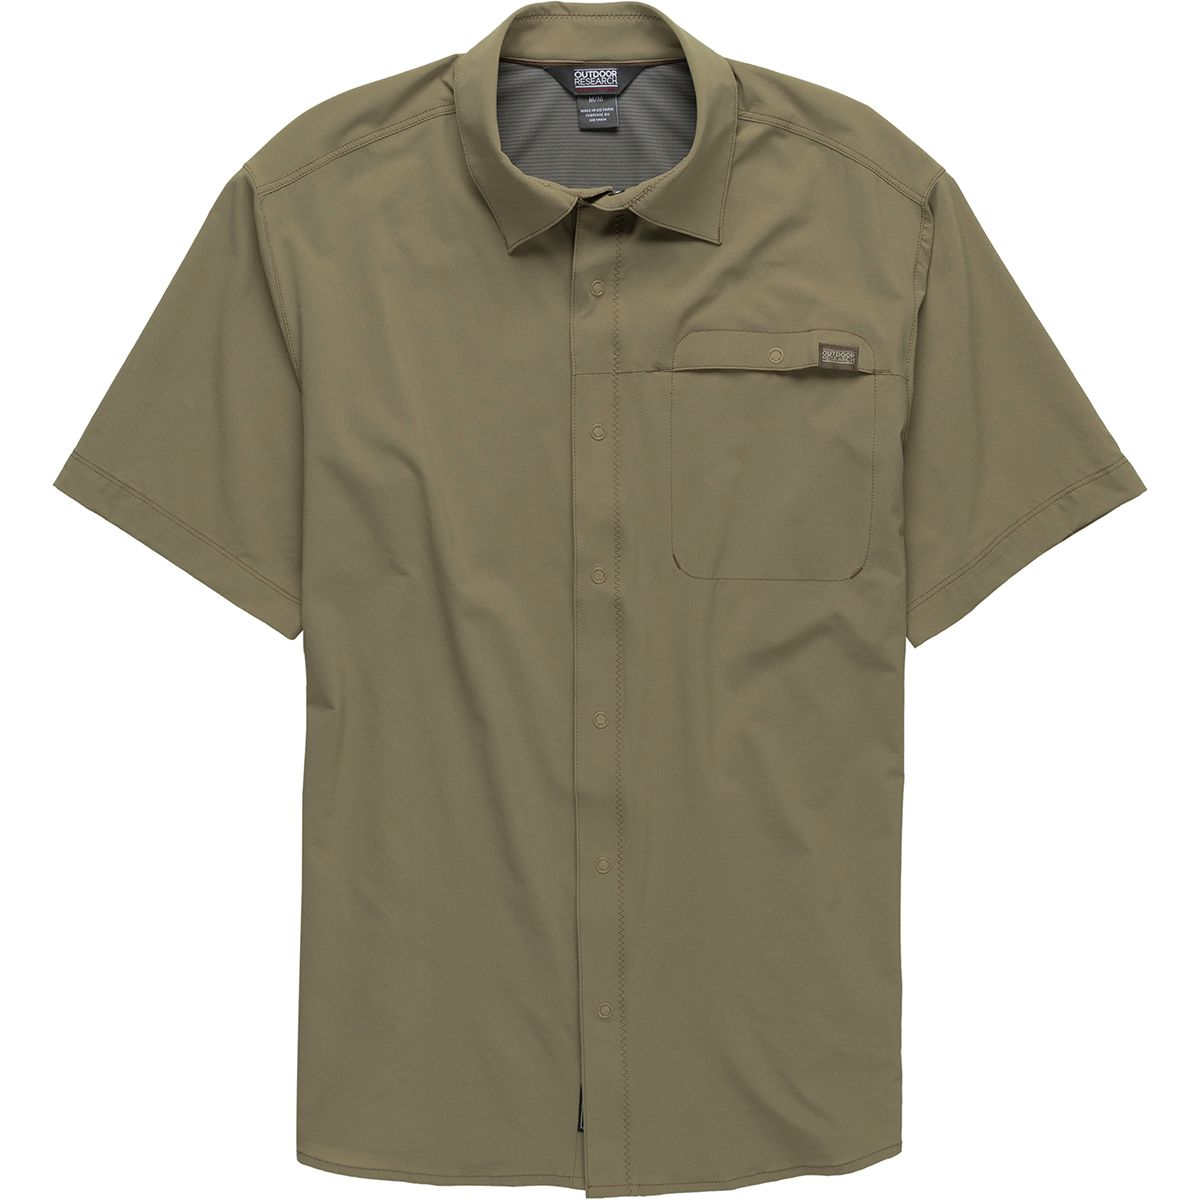 Outdoor Research Astroman S/S Sun Shirt